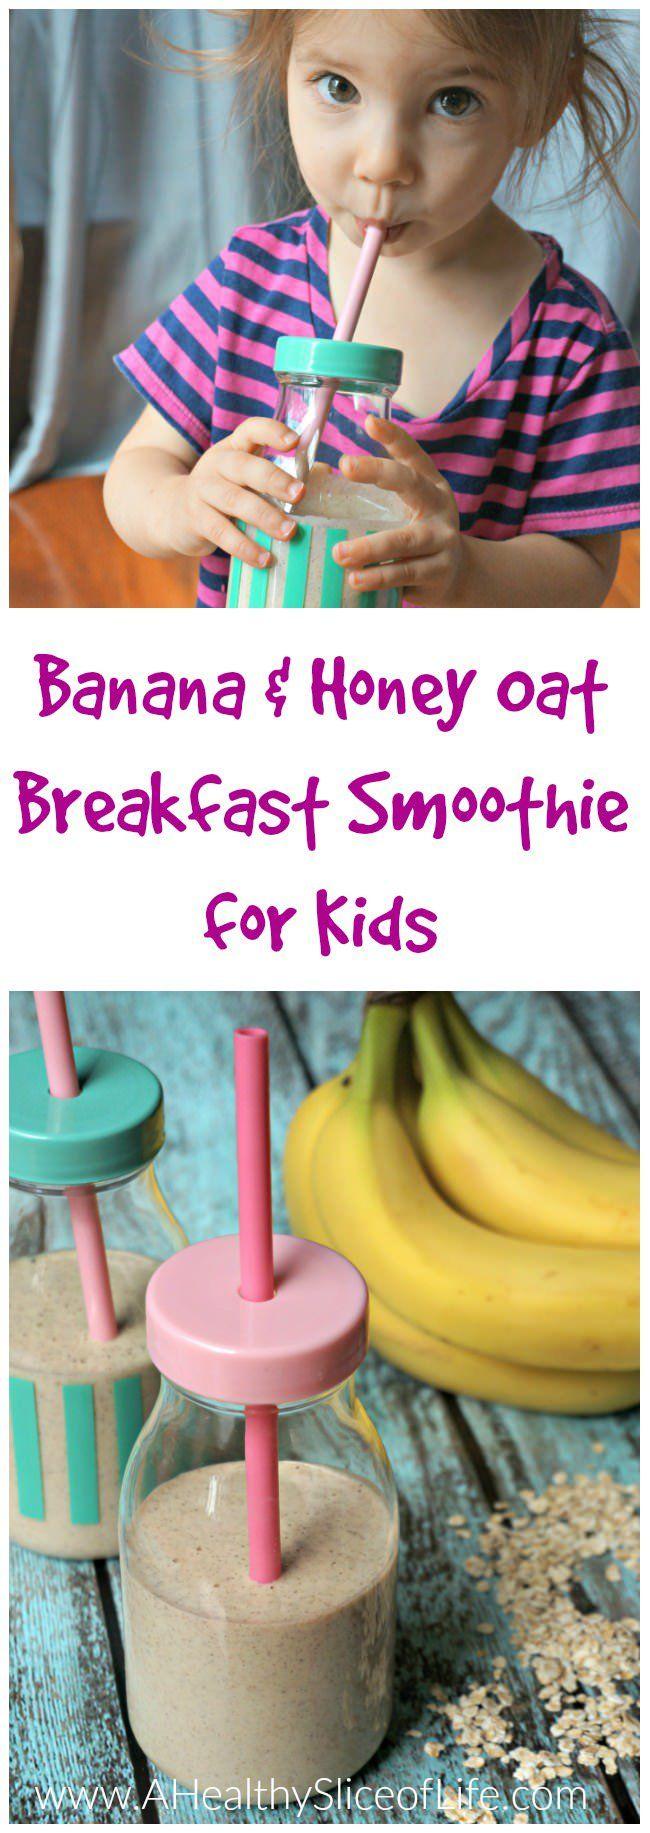 banana and honey oat breakfast smoothie for kids